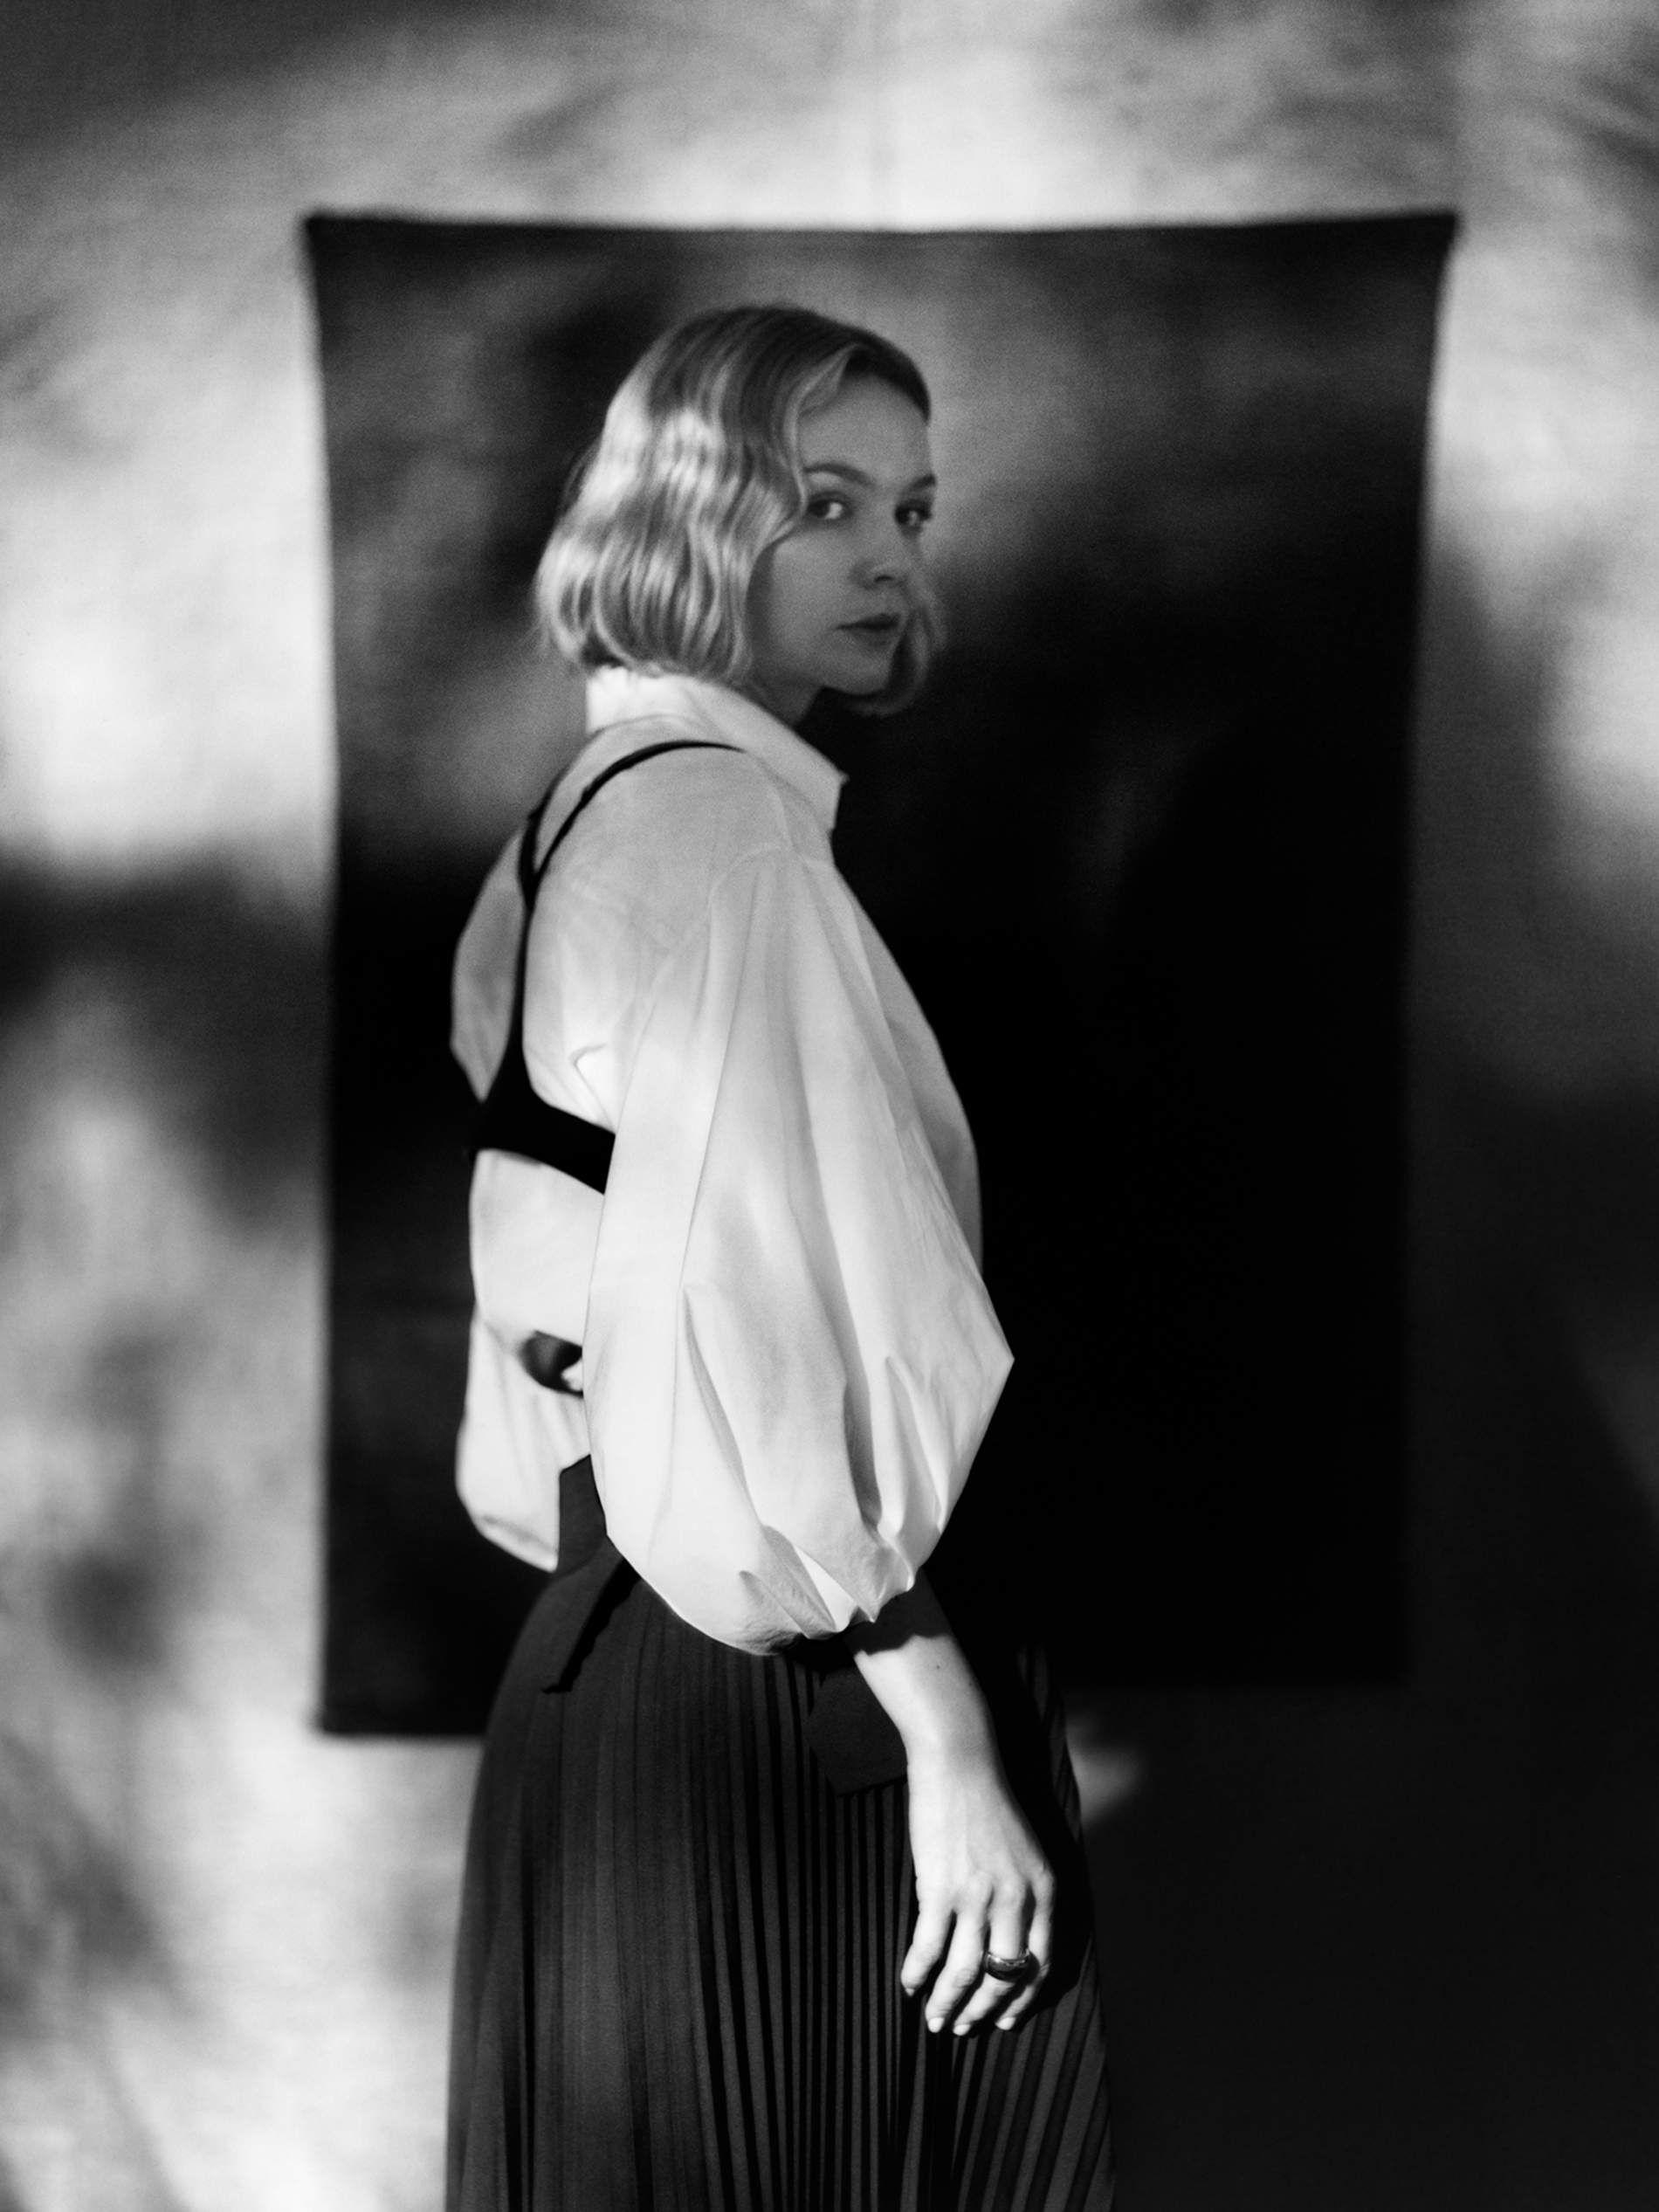 Carey Mulligan Talks Rom Com Revelations New Movie Promising Young Woman Lifelong Friendships In 2020 Carey Mulligan Porter Magazine Carey